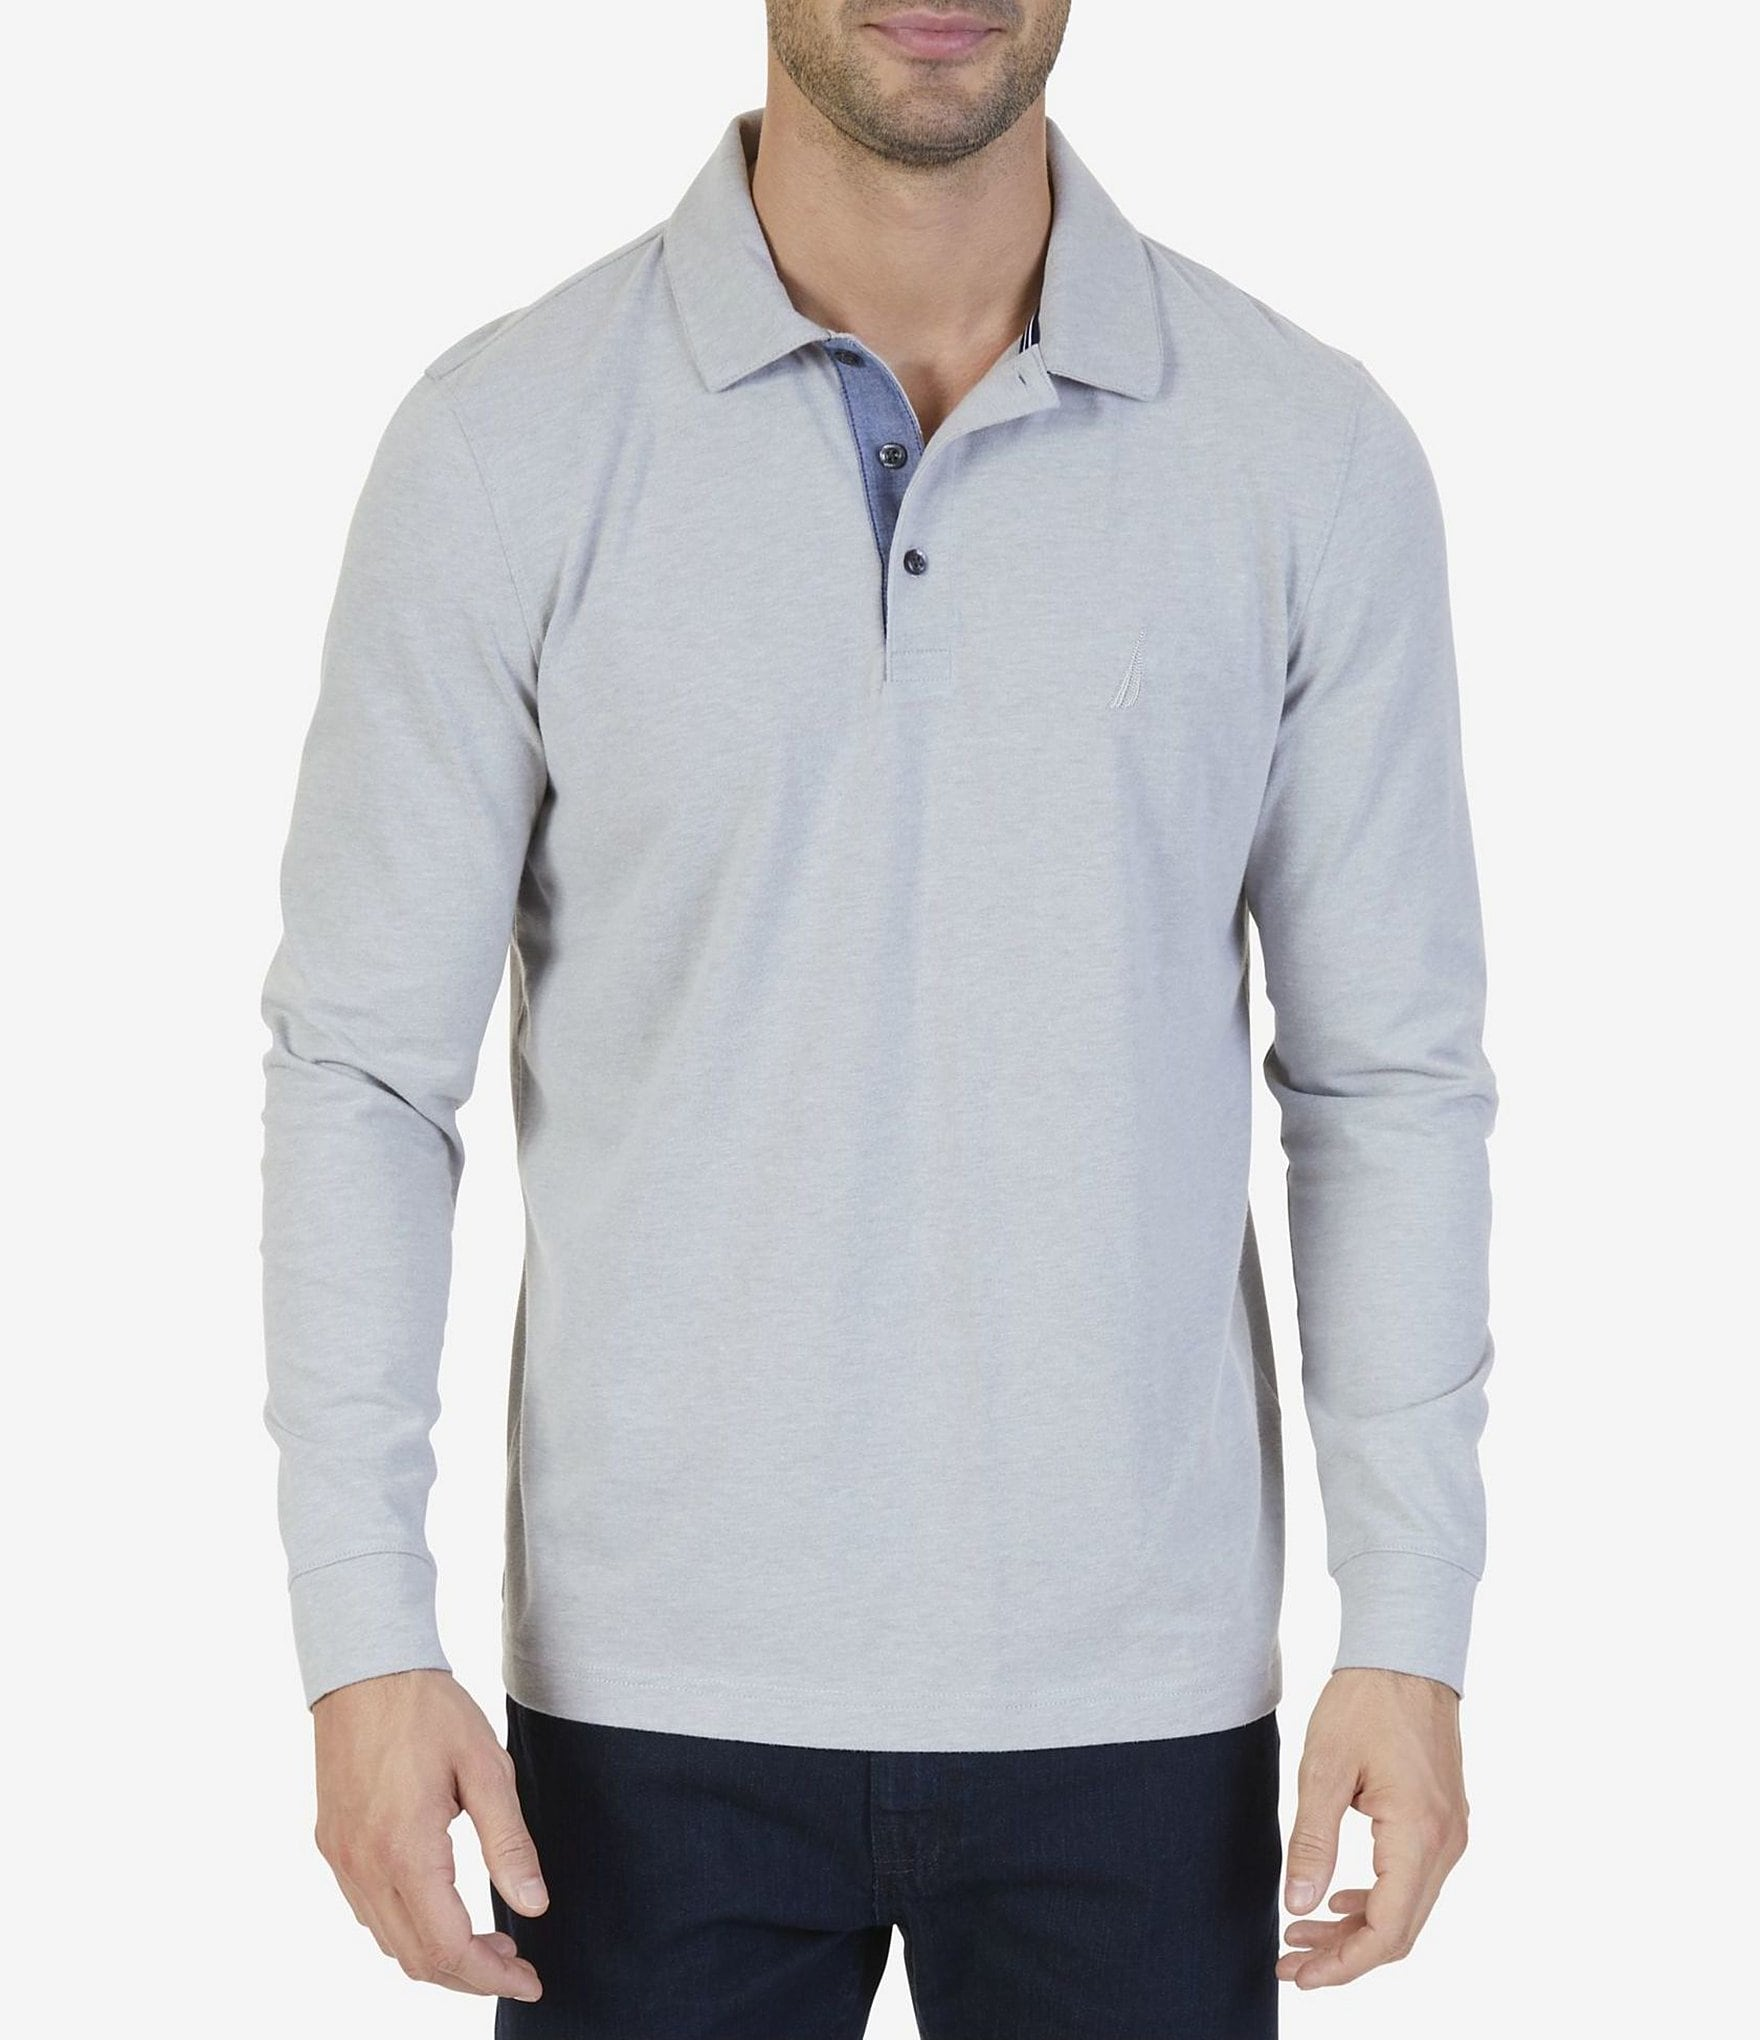 Nautica classic fit long sleeve polo shirt dillards for Long sleeve fitted polo shirts